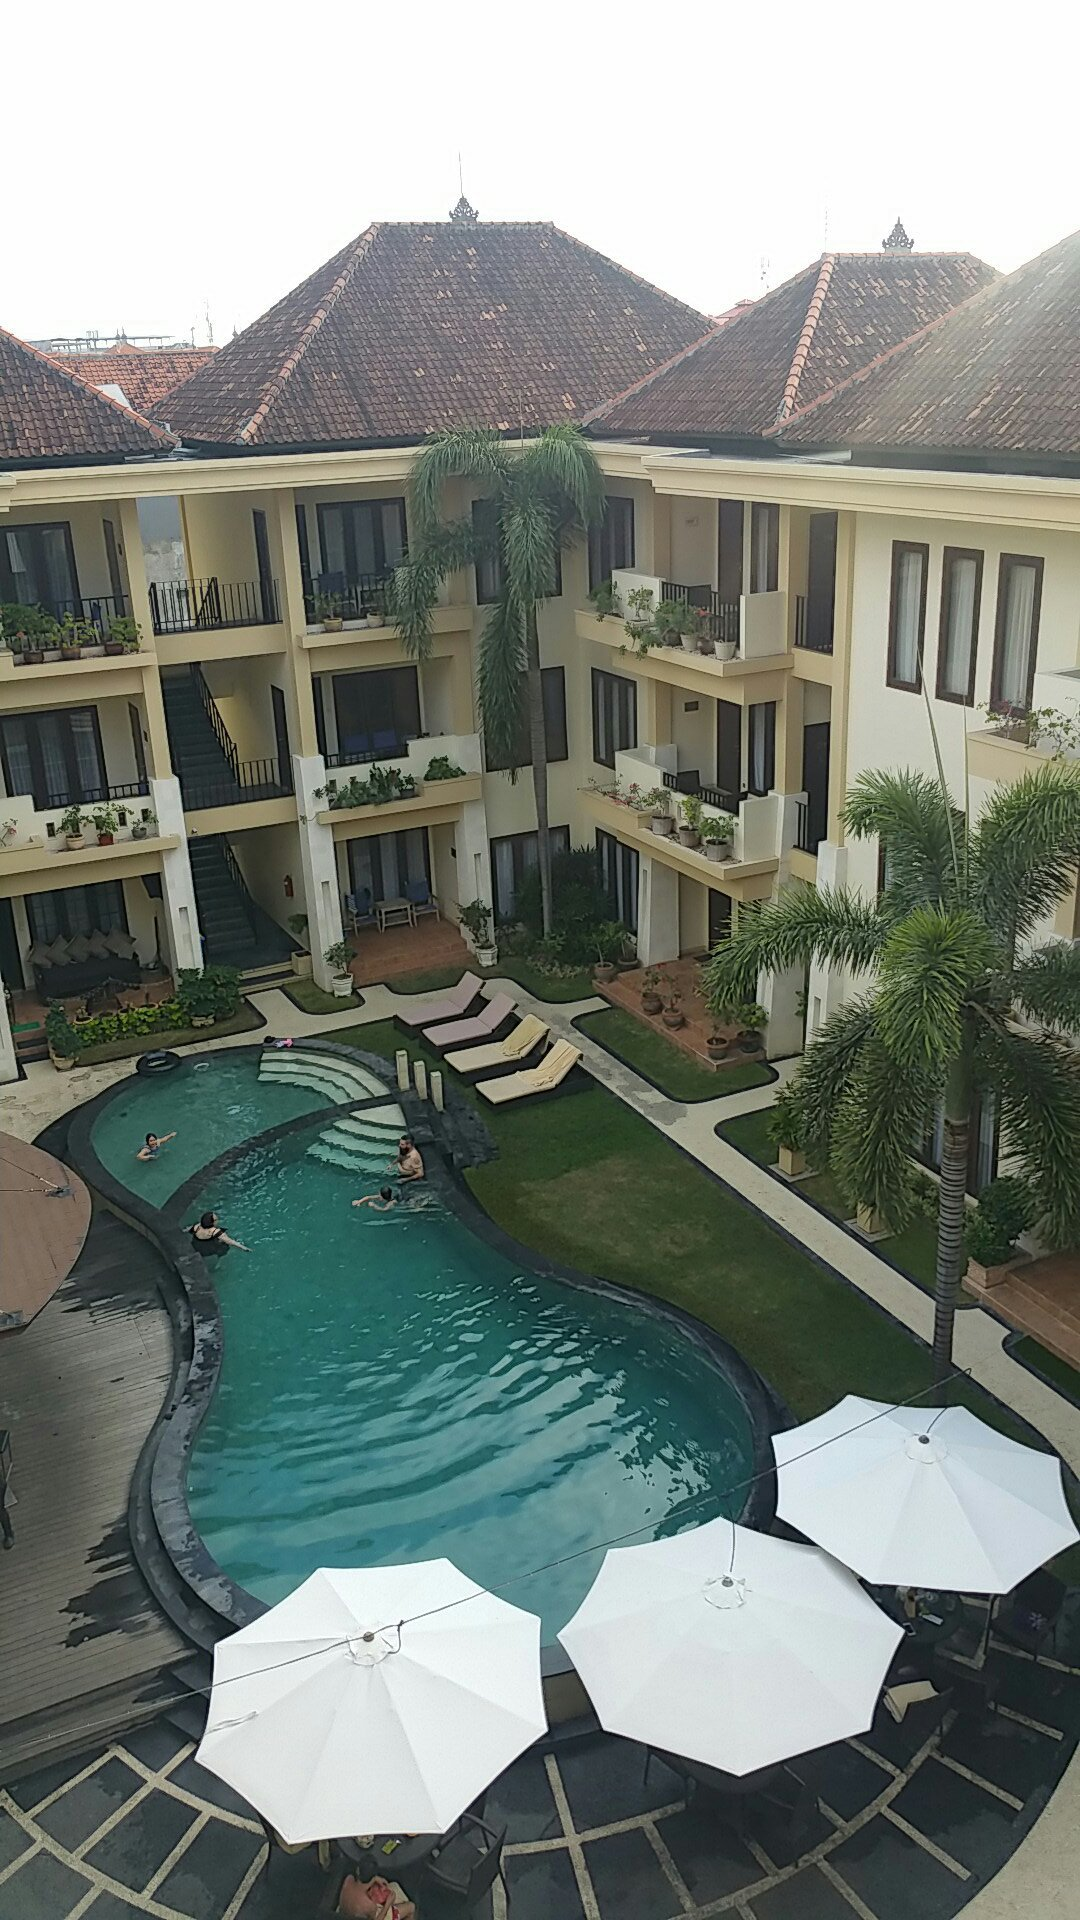 Kuta townhouses picture of kuta town house apartments kuta - Kuta Townhouse Apartments 44 6 8 Updated 2017 Prices Condominium Reviews Bali Tripadvisor